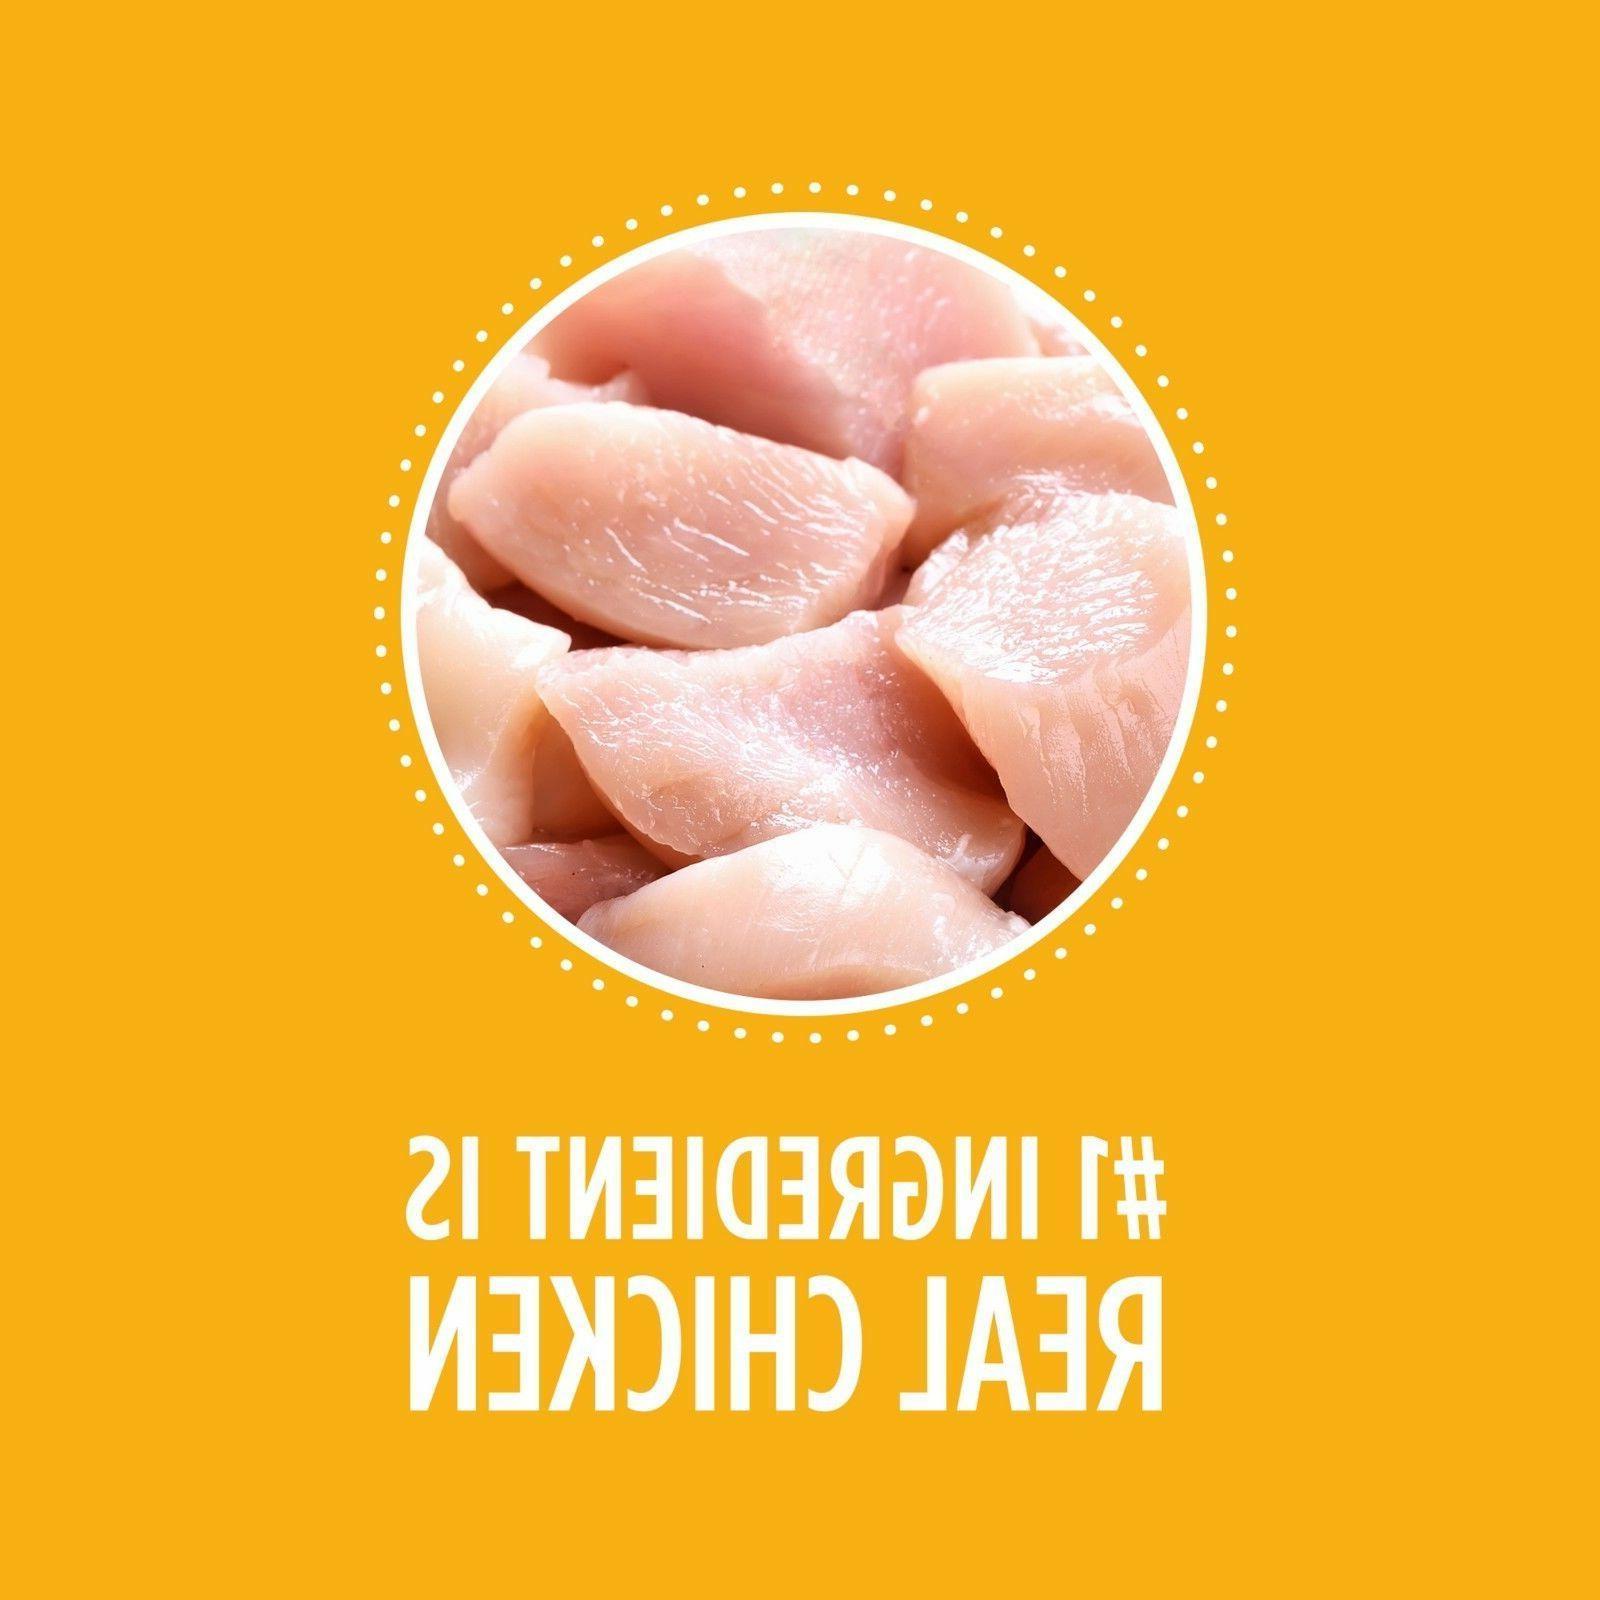 IAMS PROACTIVE Dog Food Chicken, lb.